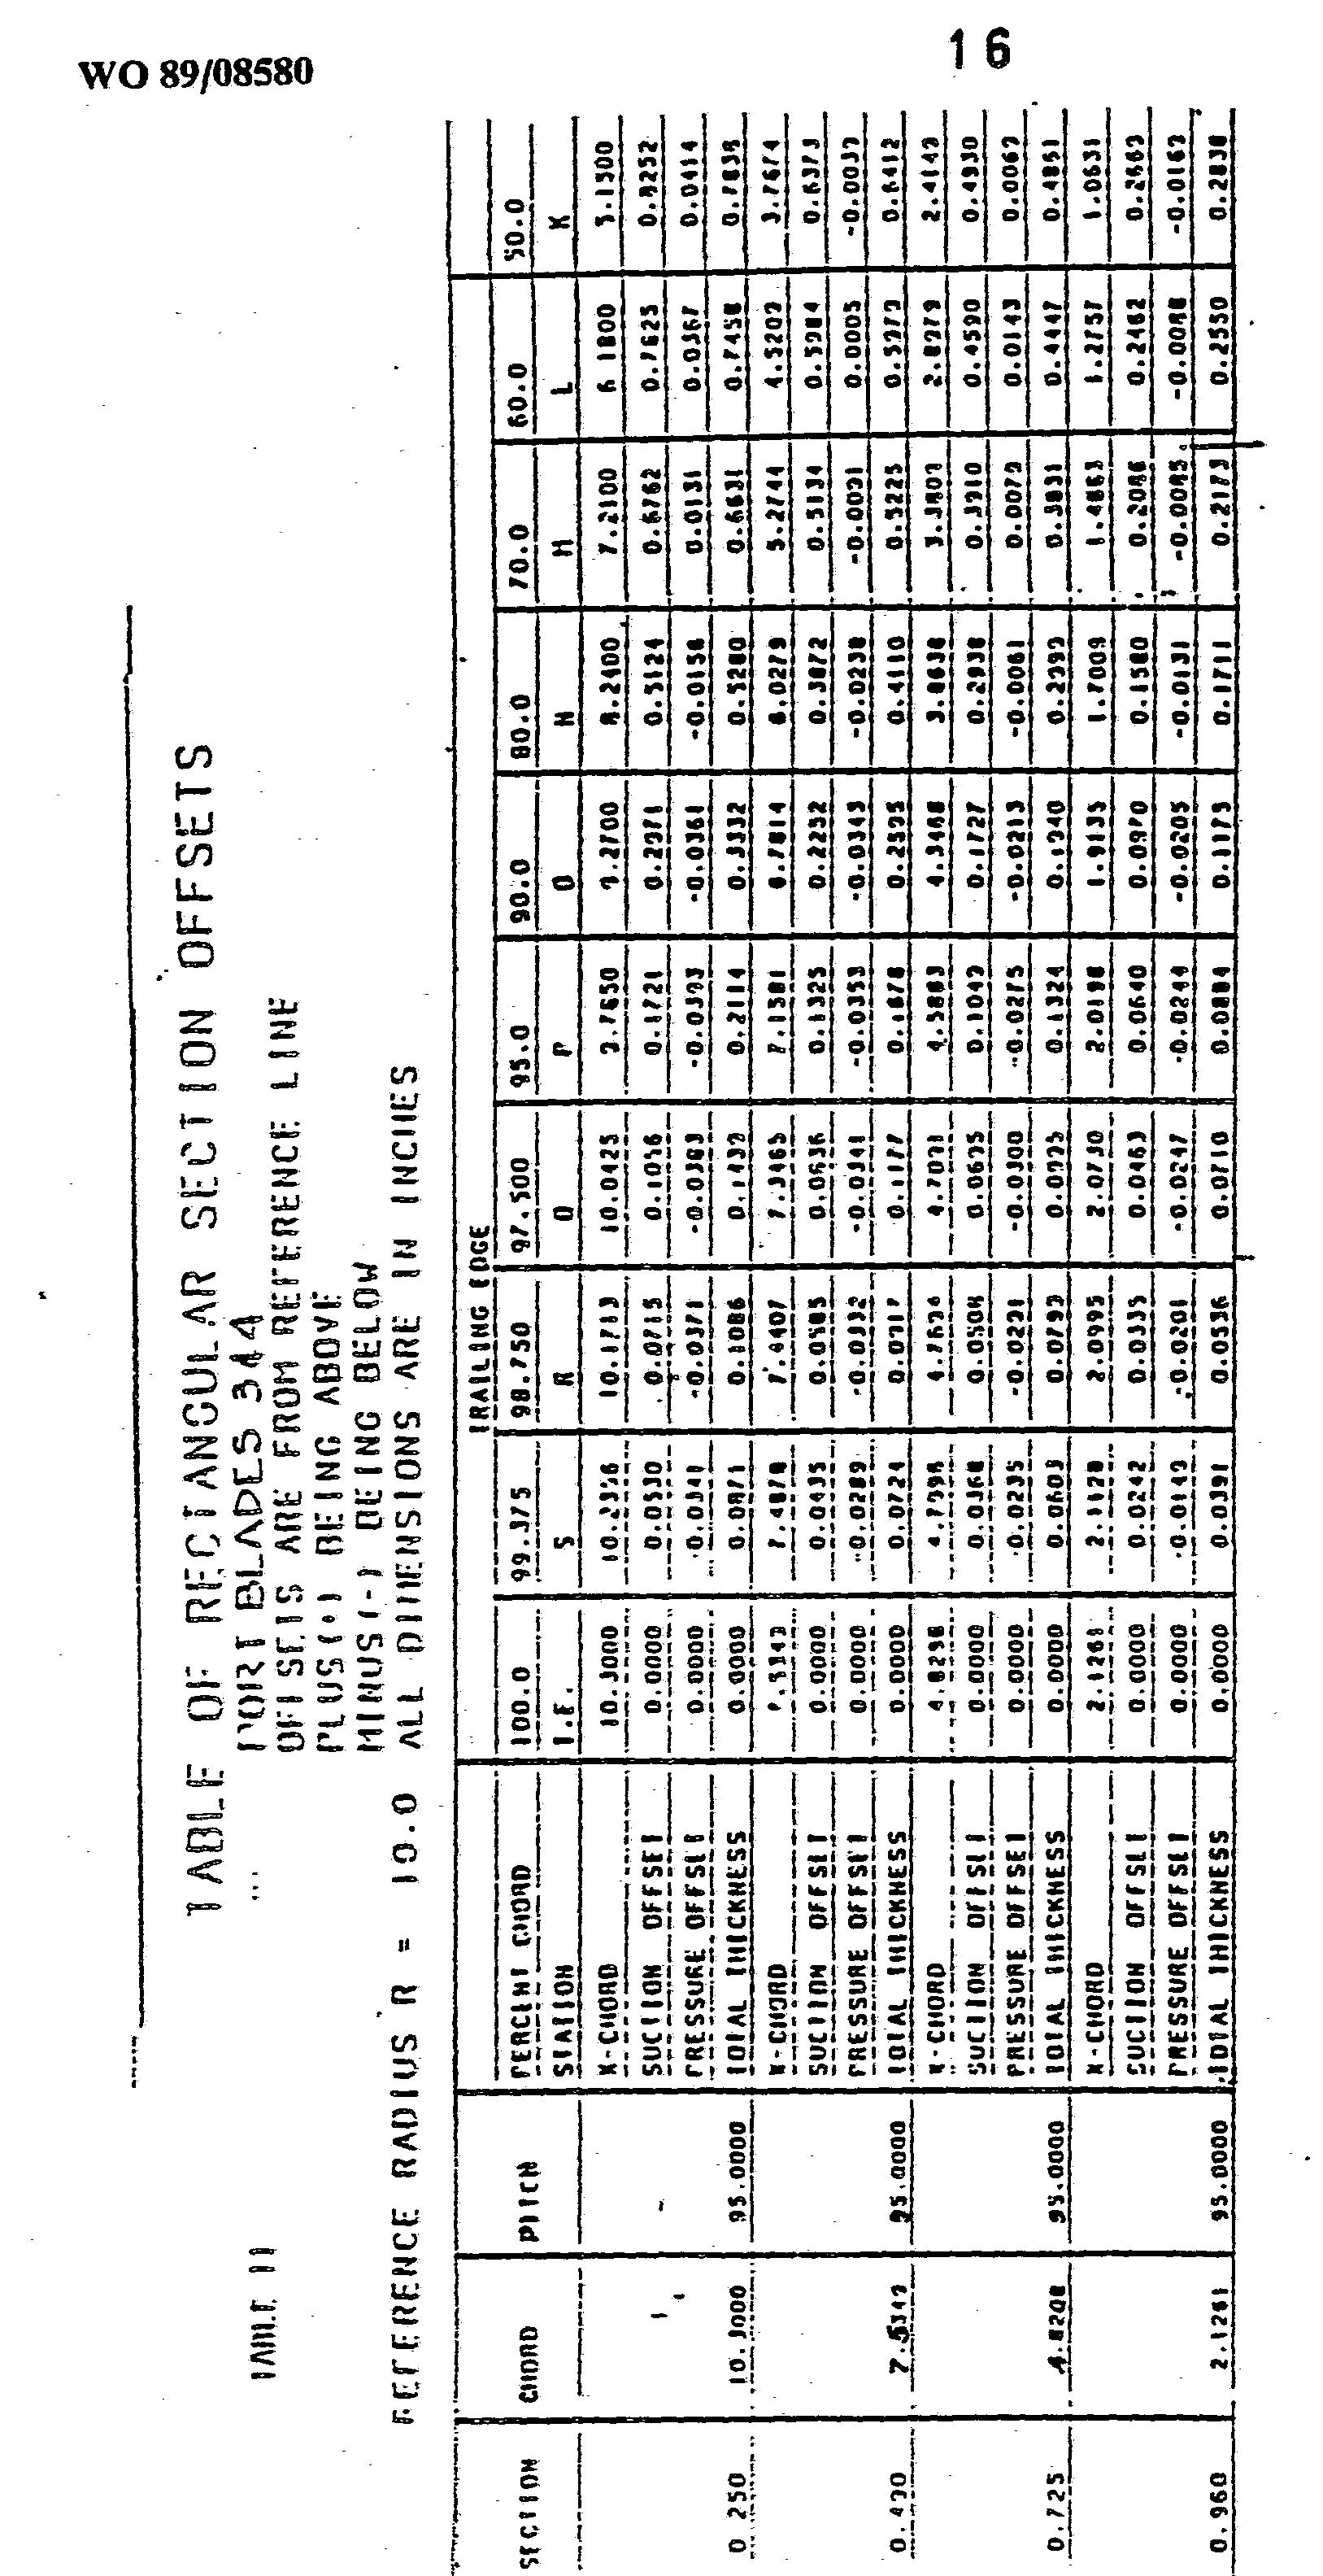 WO1989008580A2 - Energy efficient asymmetric pre-swirl vane